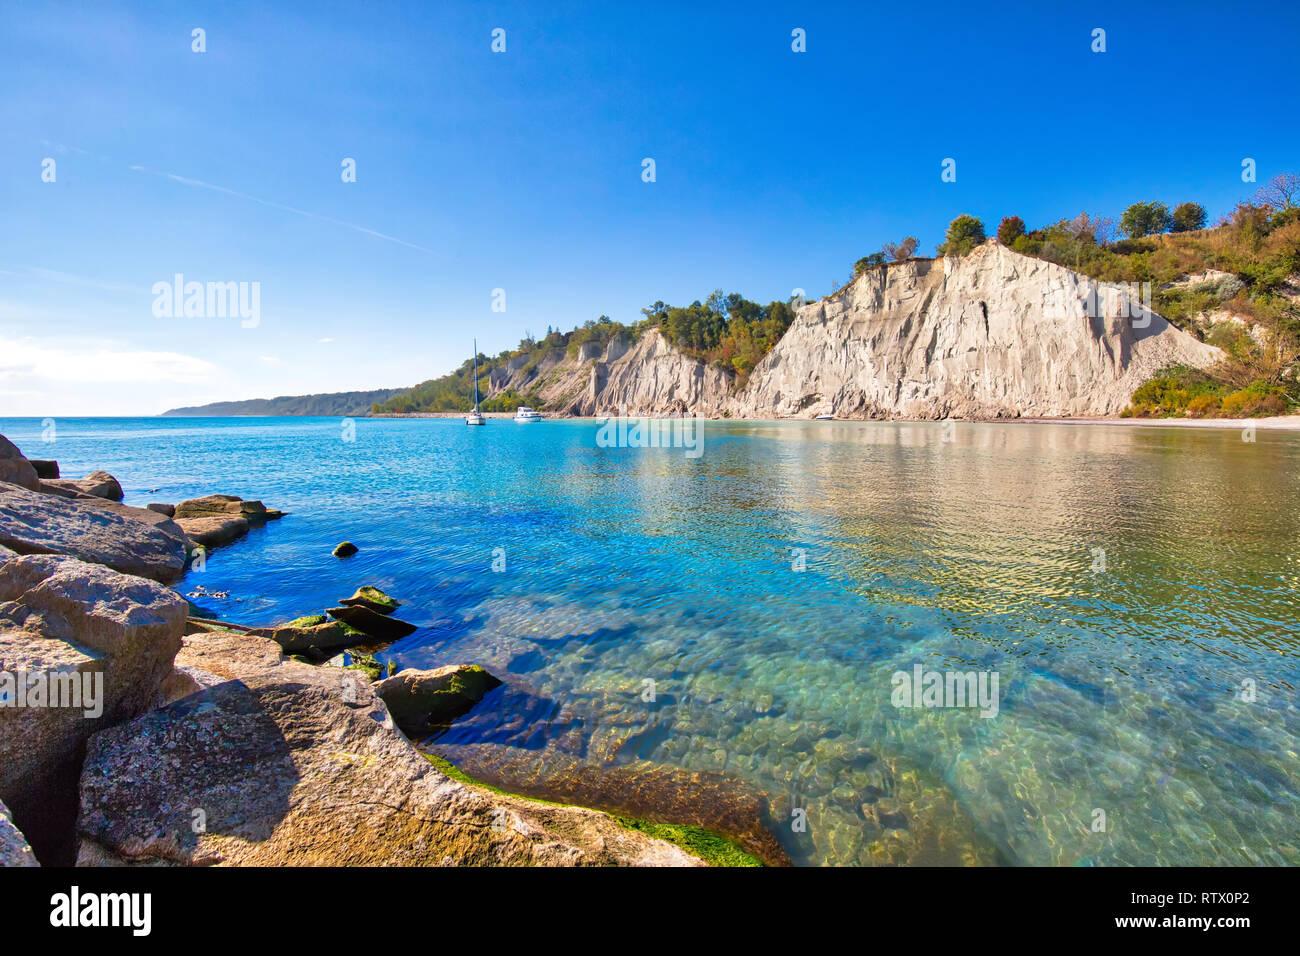 Toronto, Scénic Scarborough Bluffs frente a la orilla del lago Ontario Foto de stock